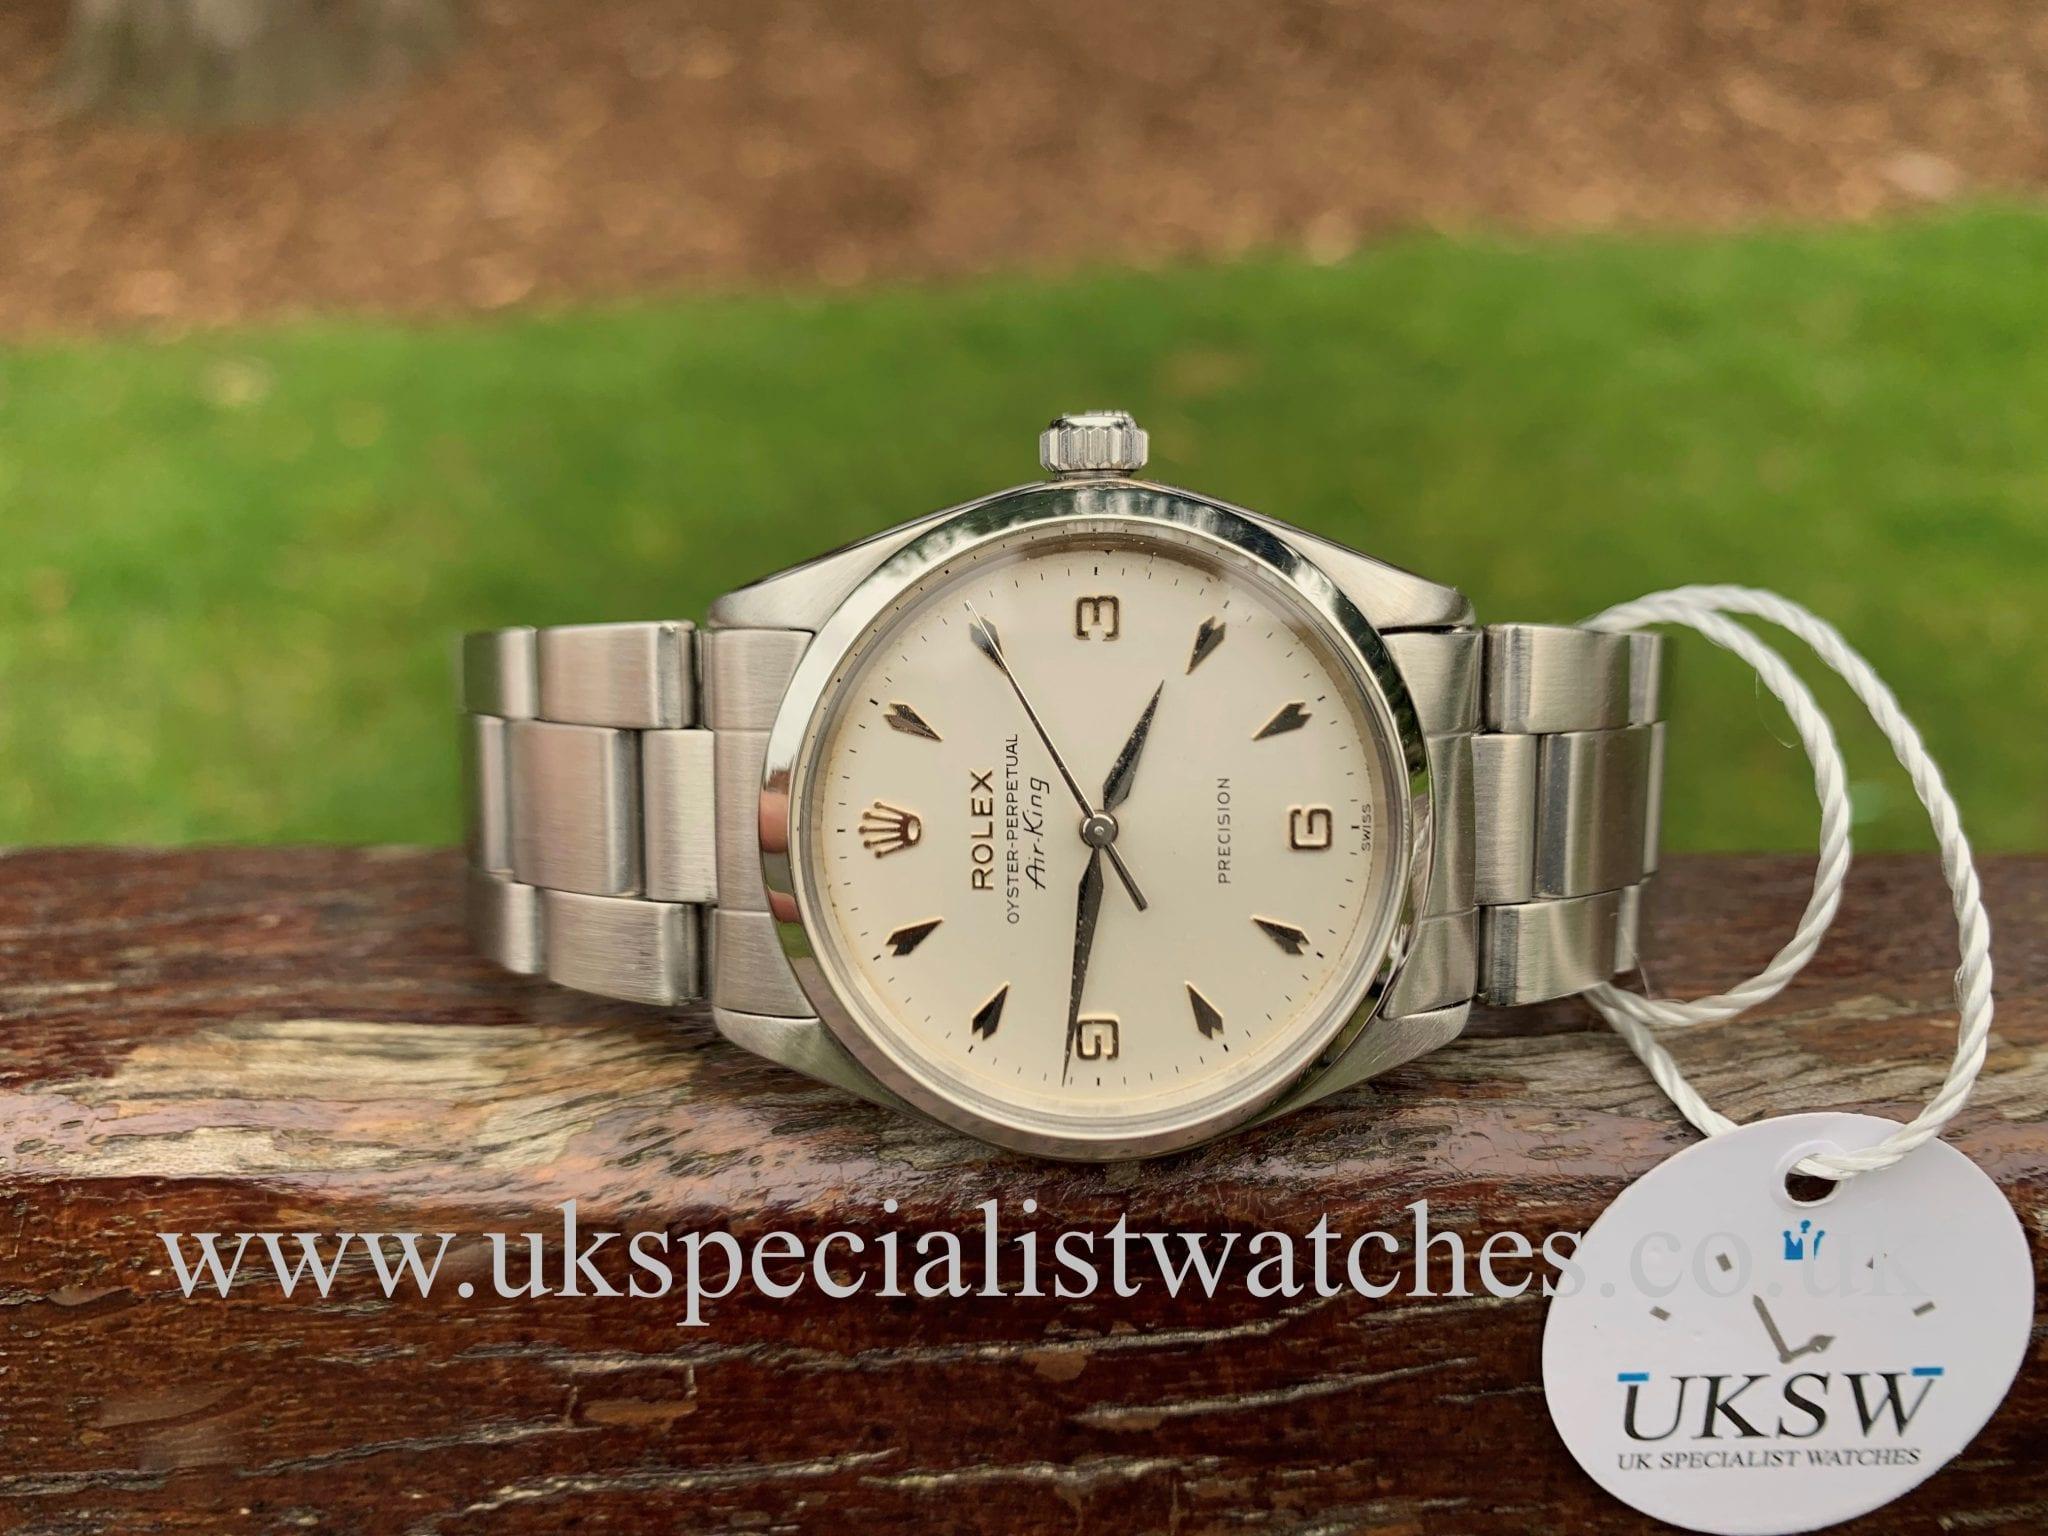 76a20fb918c0d Rolex Air King 5500 3-6-9 - Arrow Head Dial - Vintage 1964 - UK ...